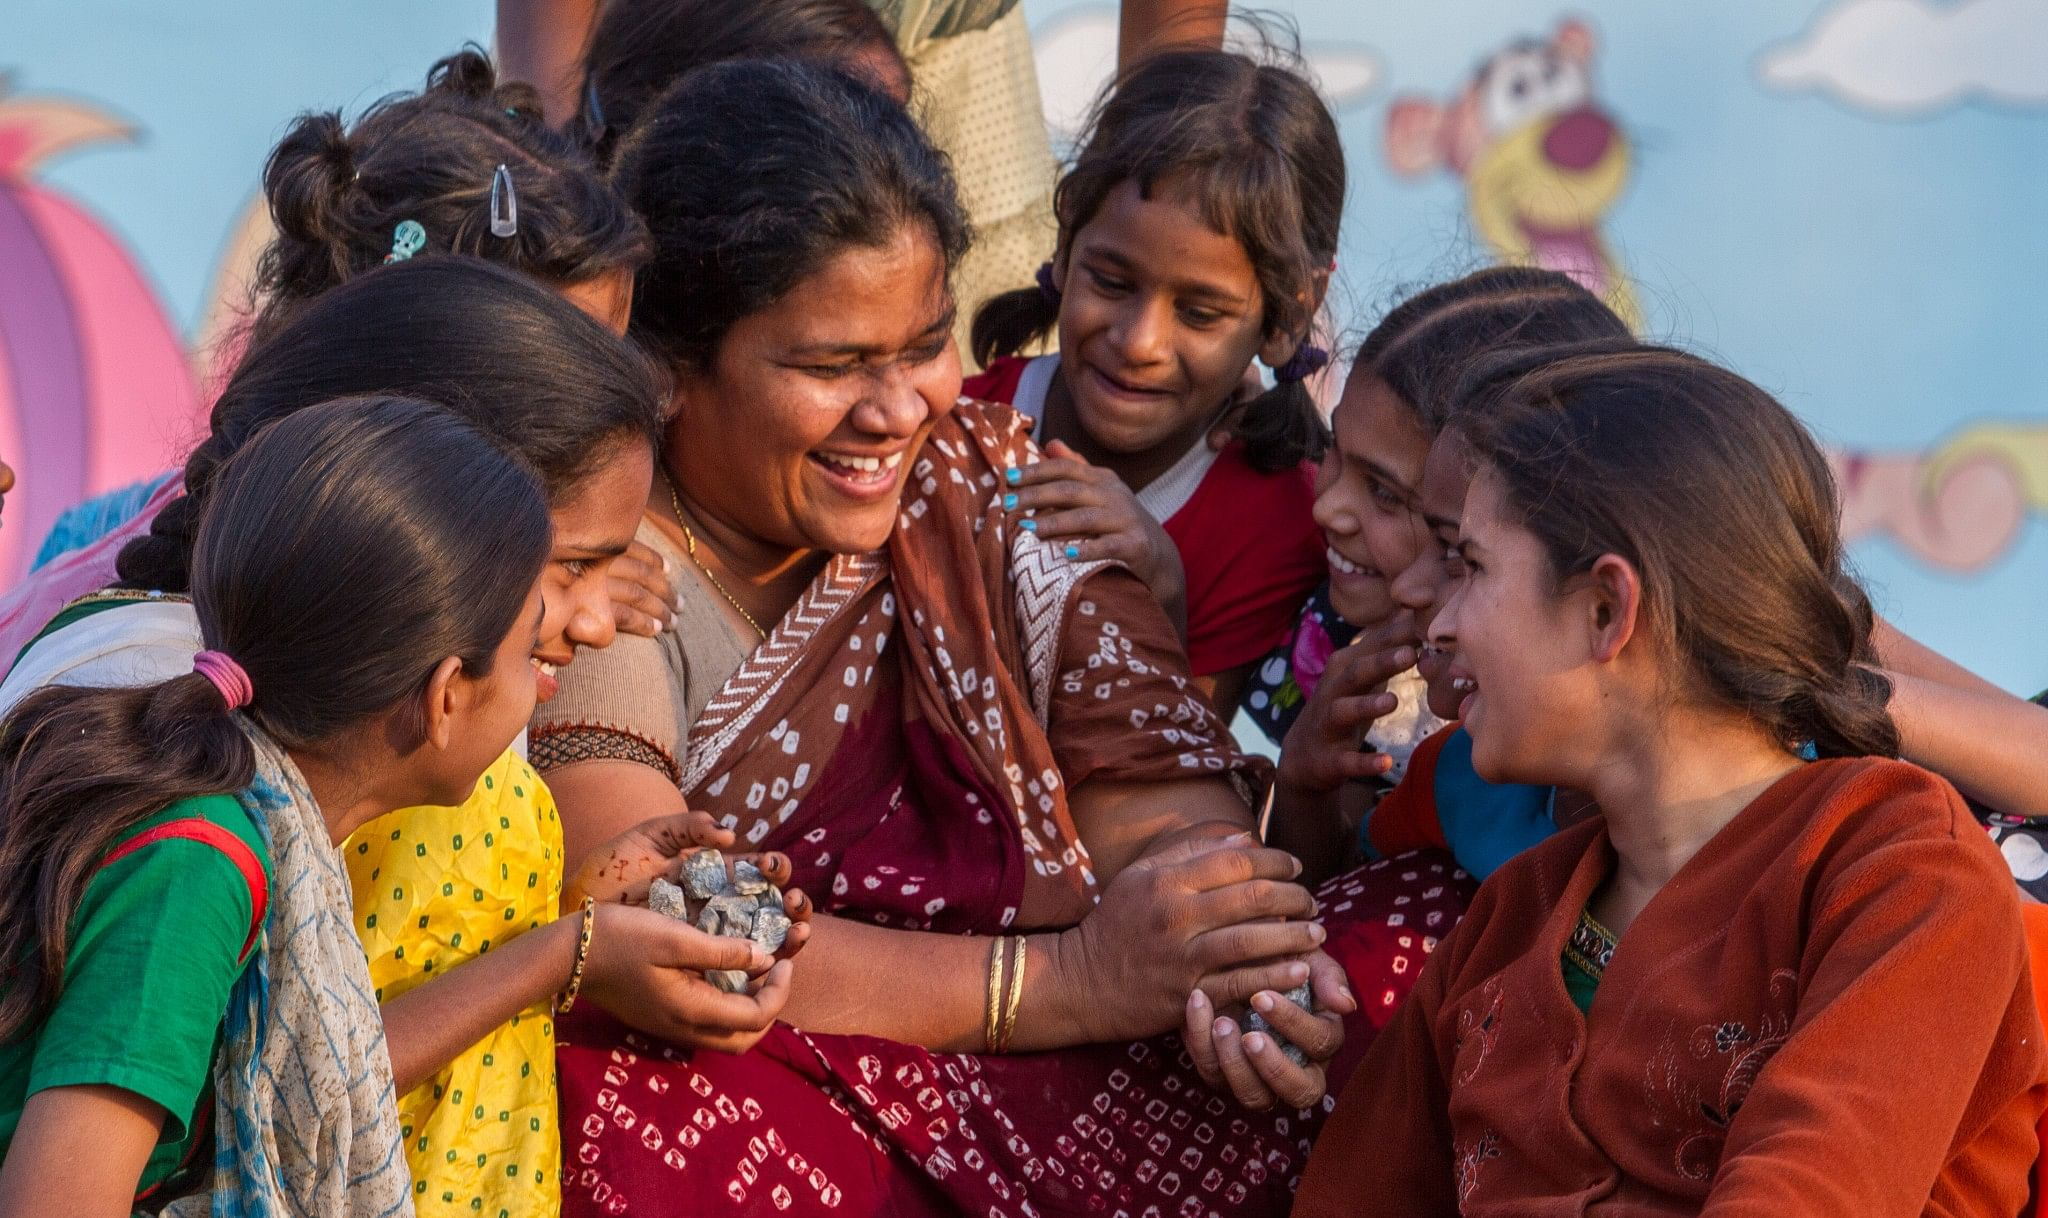 Shobha treats the kids like her own.